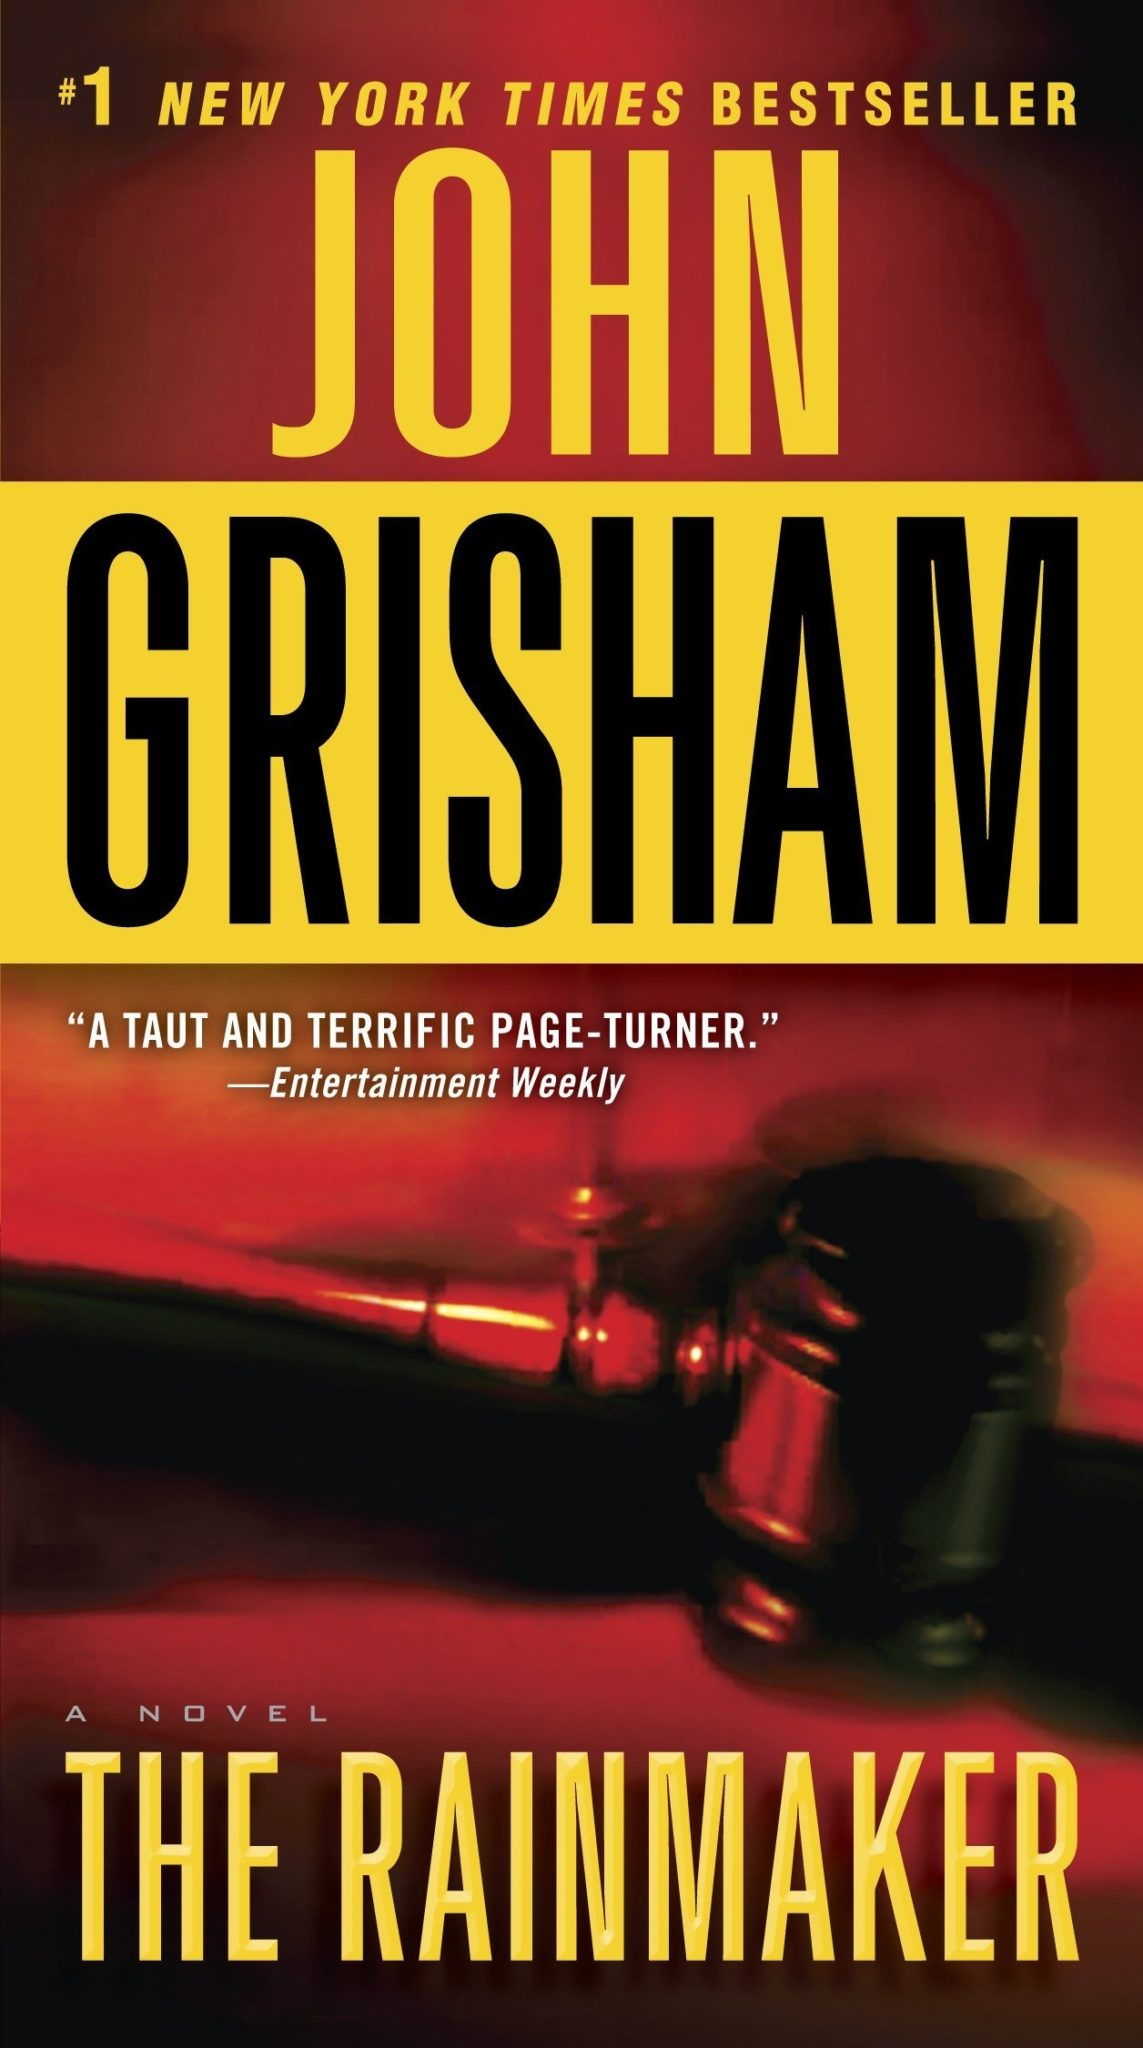 John Grisham books 8